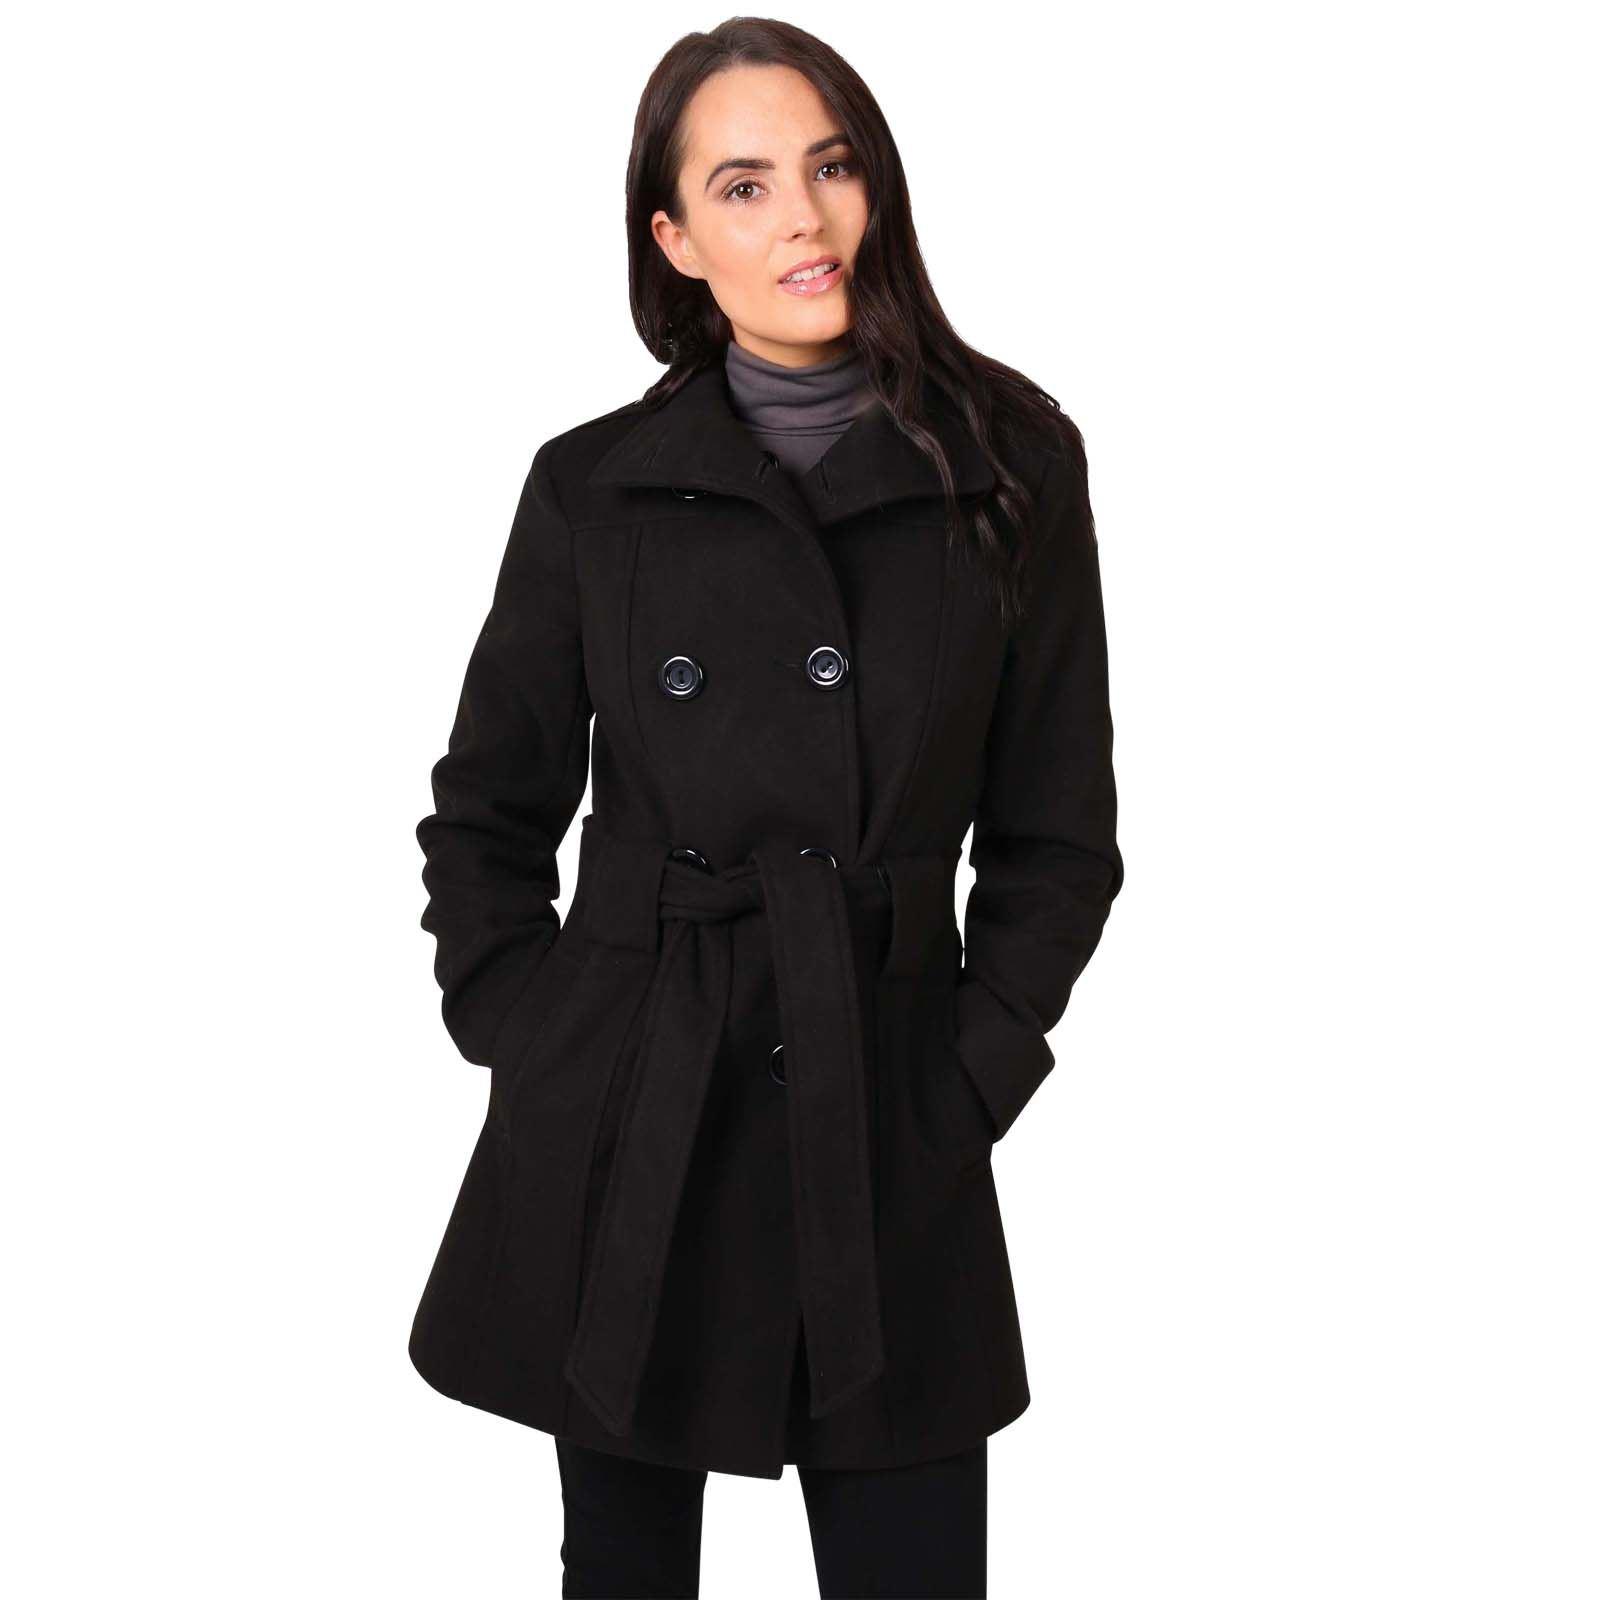 Winter Jacket For Ladies